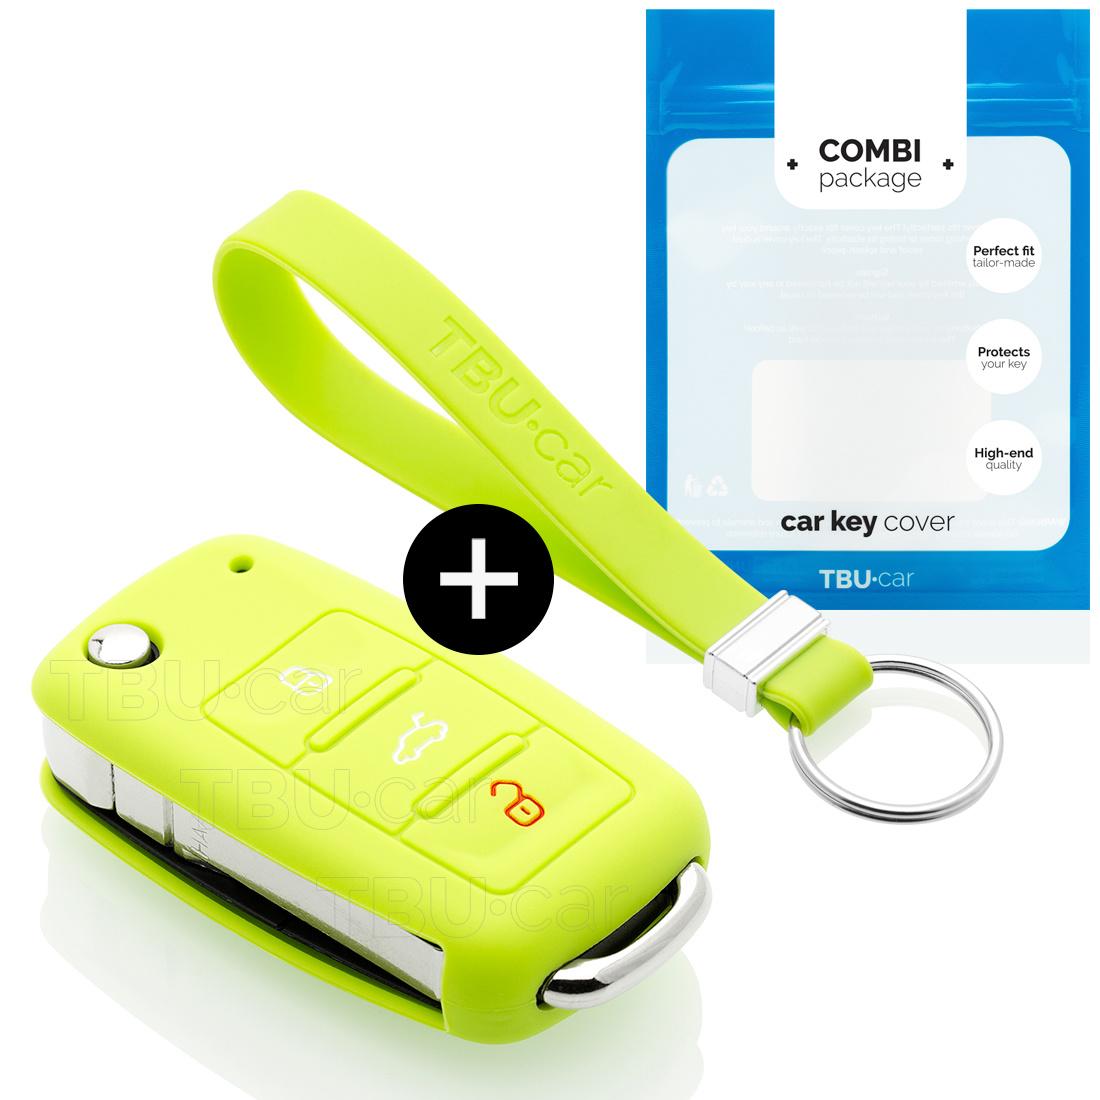 Skoda Autoschlüssel Hülle - Silikon Schutzhülle - Schlüsselhülle Cover - Lindgrün